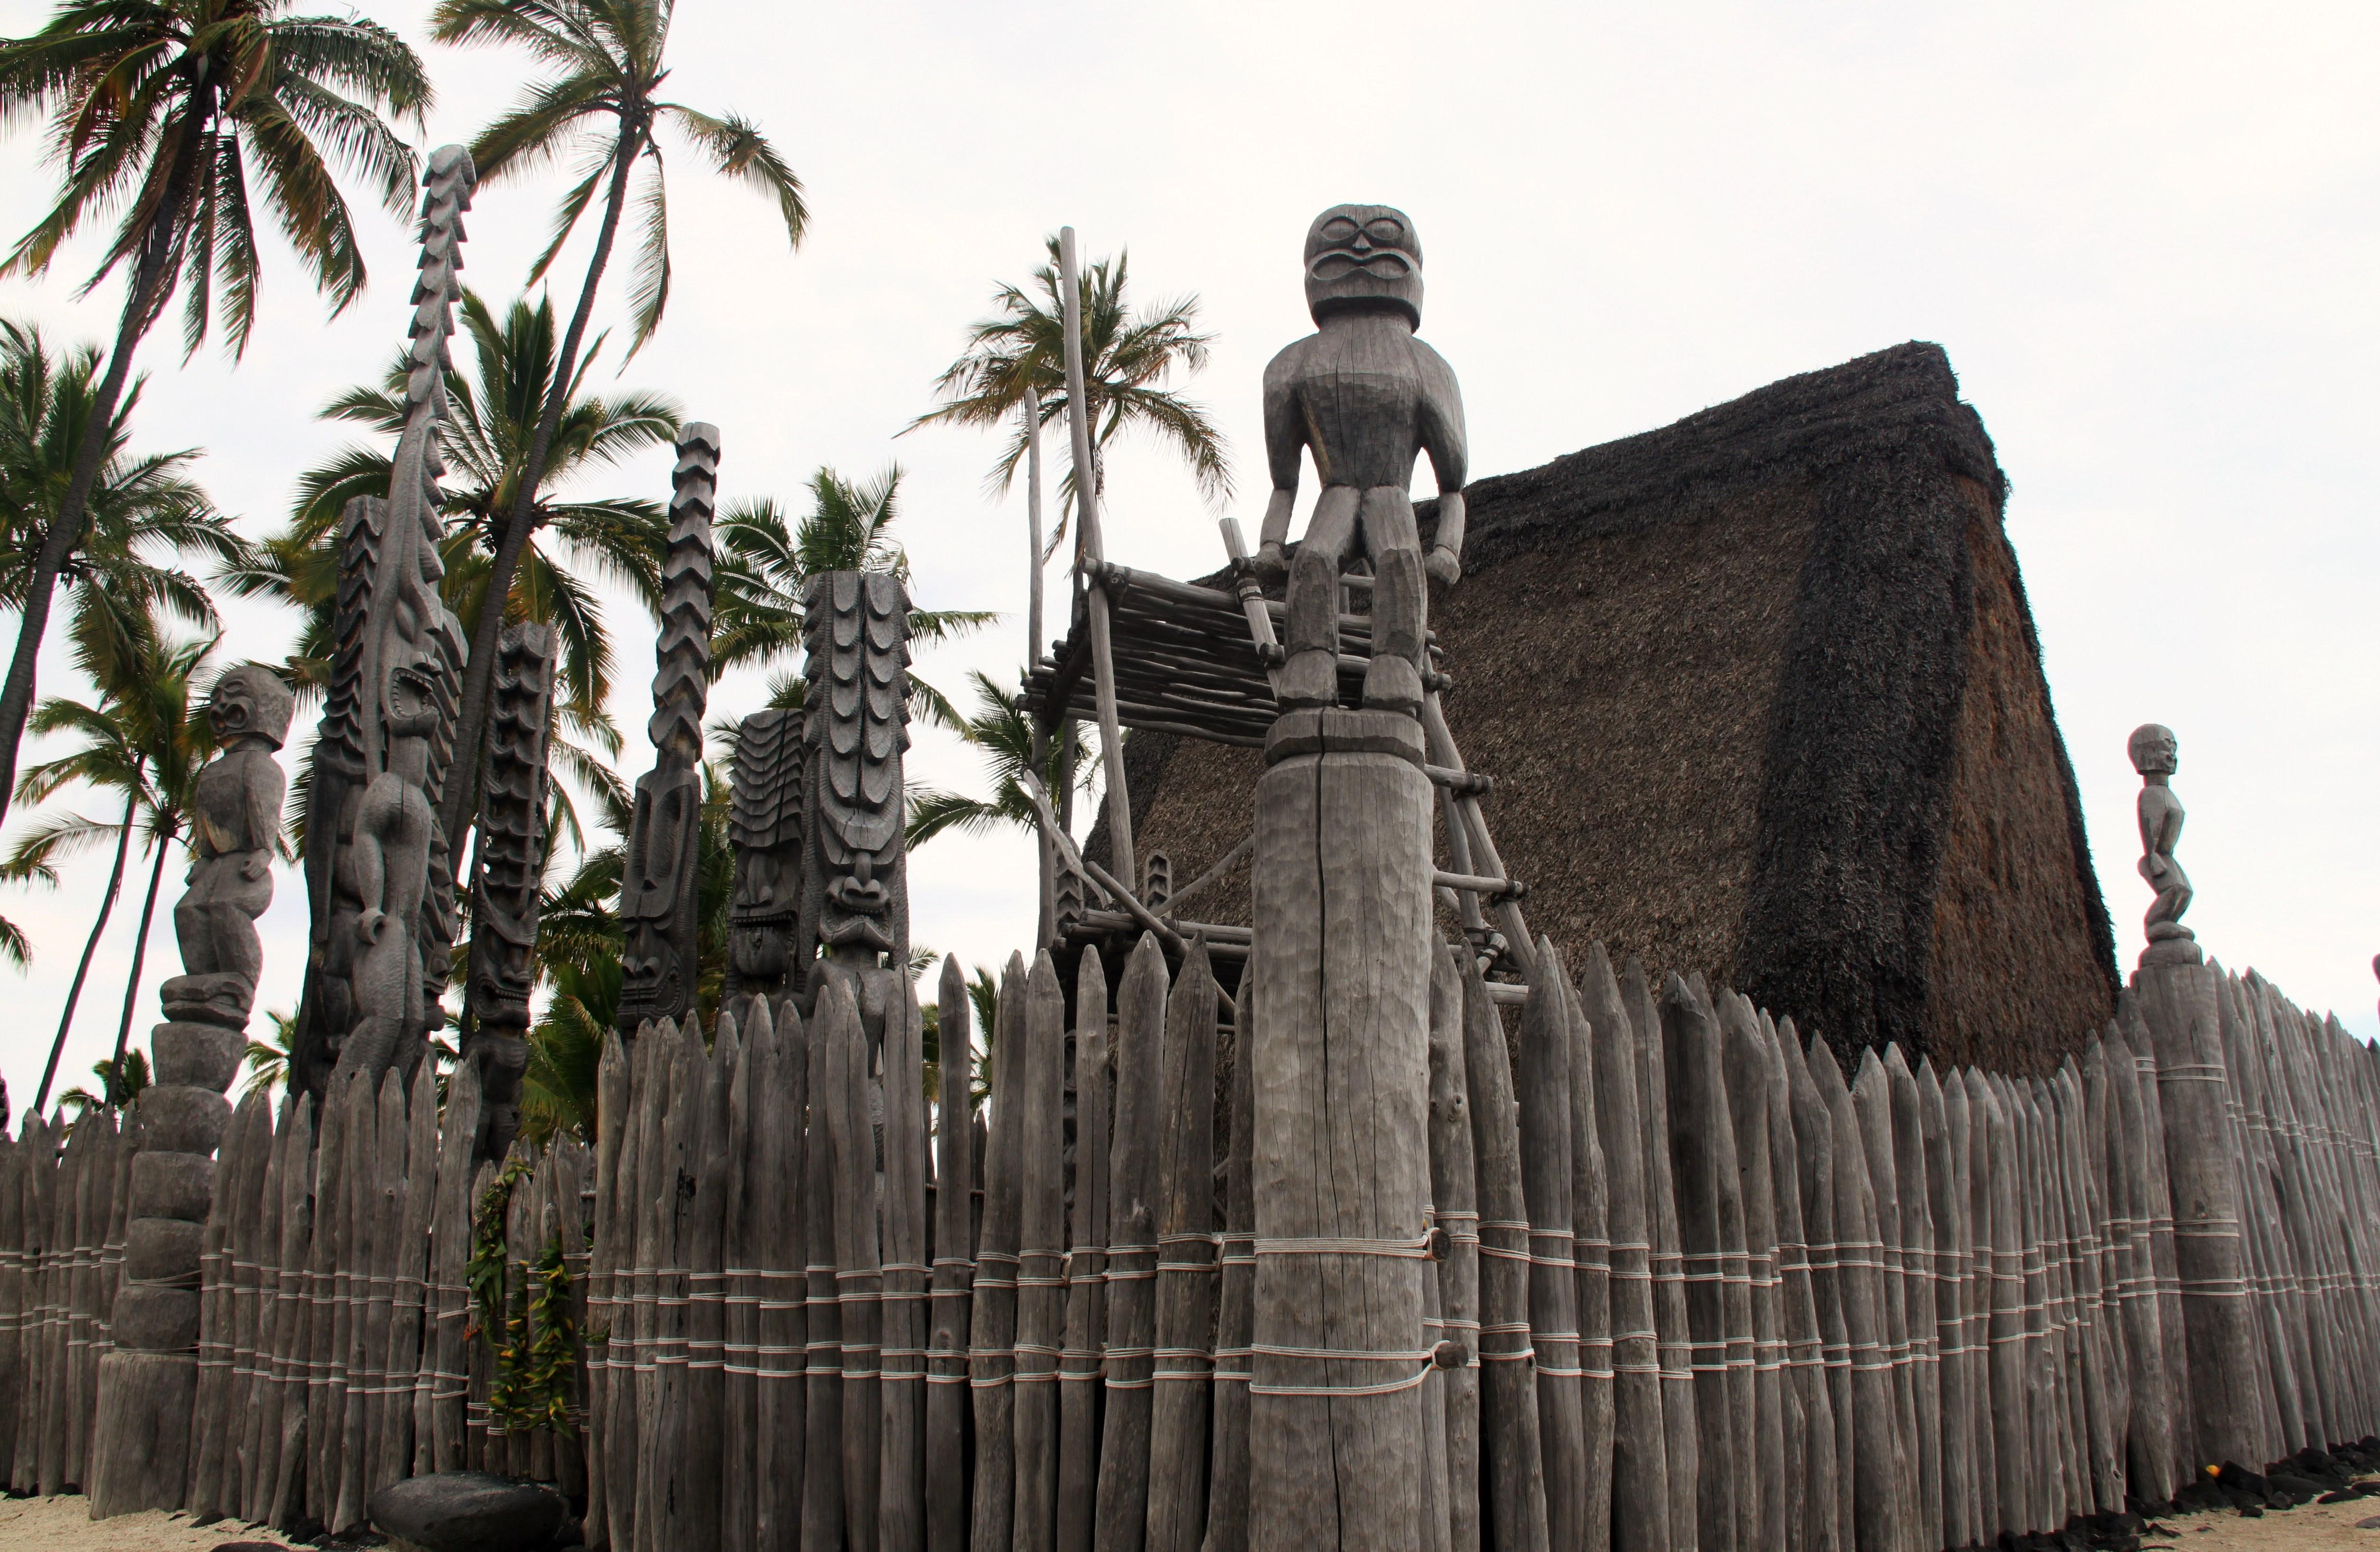 Kona Tours